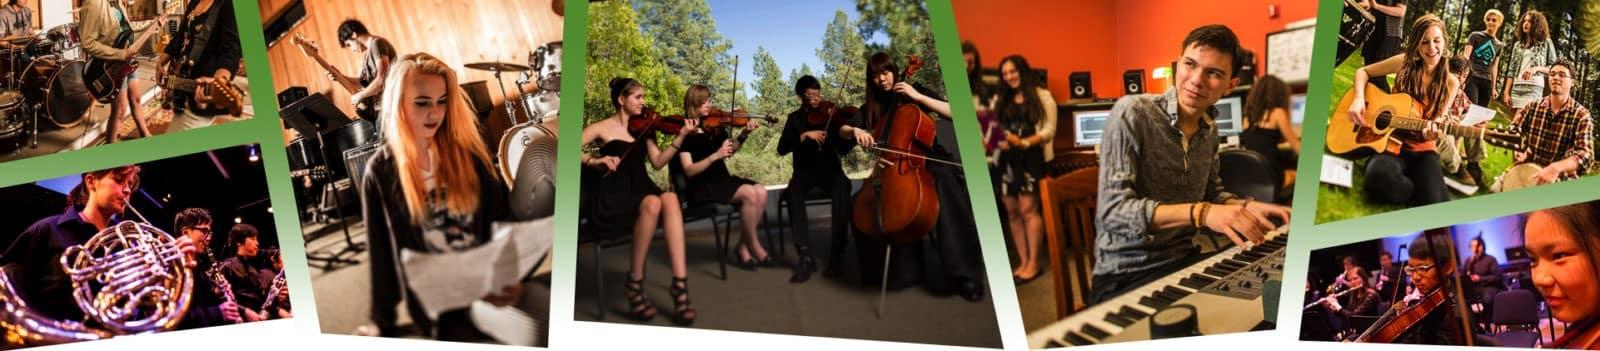 Music | Idyllwild Arts - Boarding Arts High School